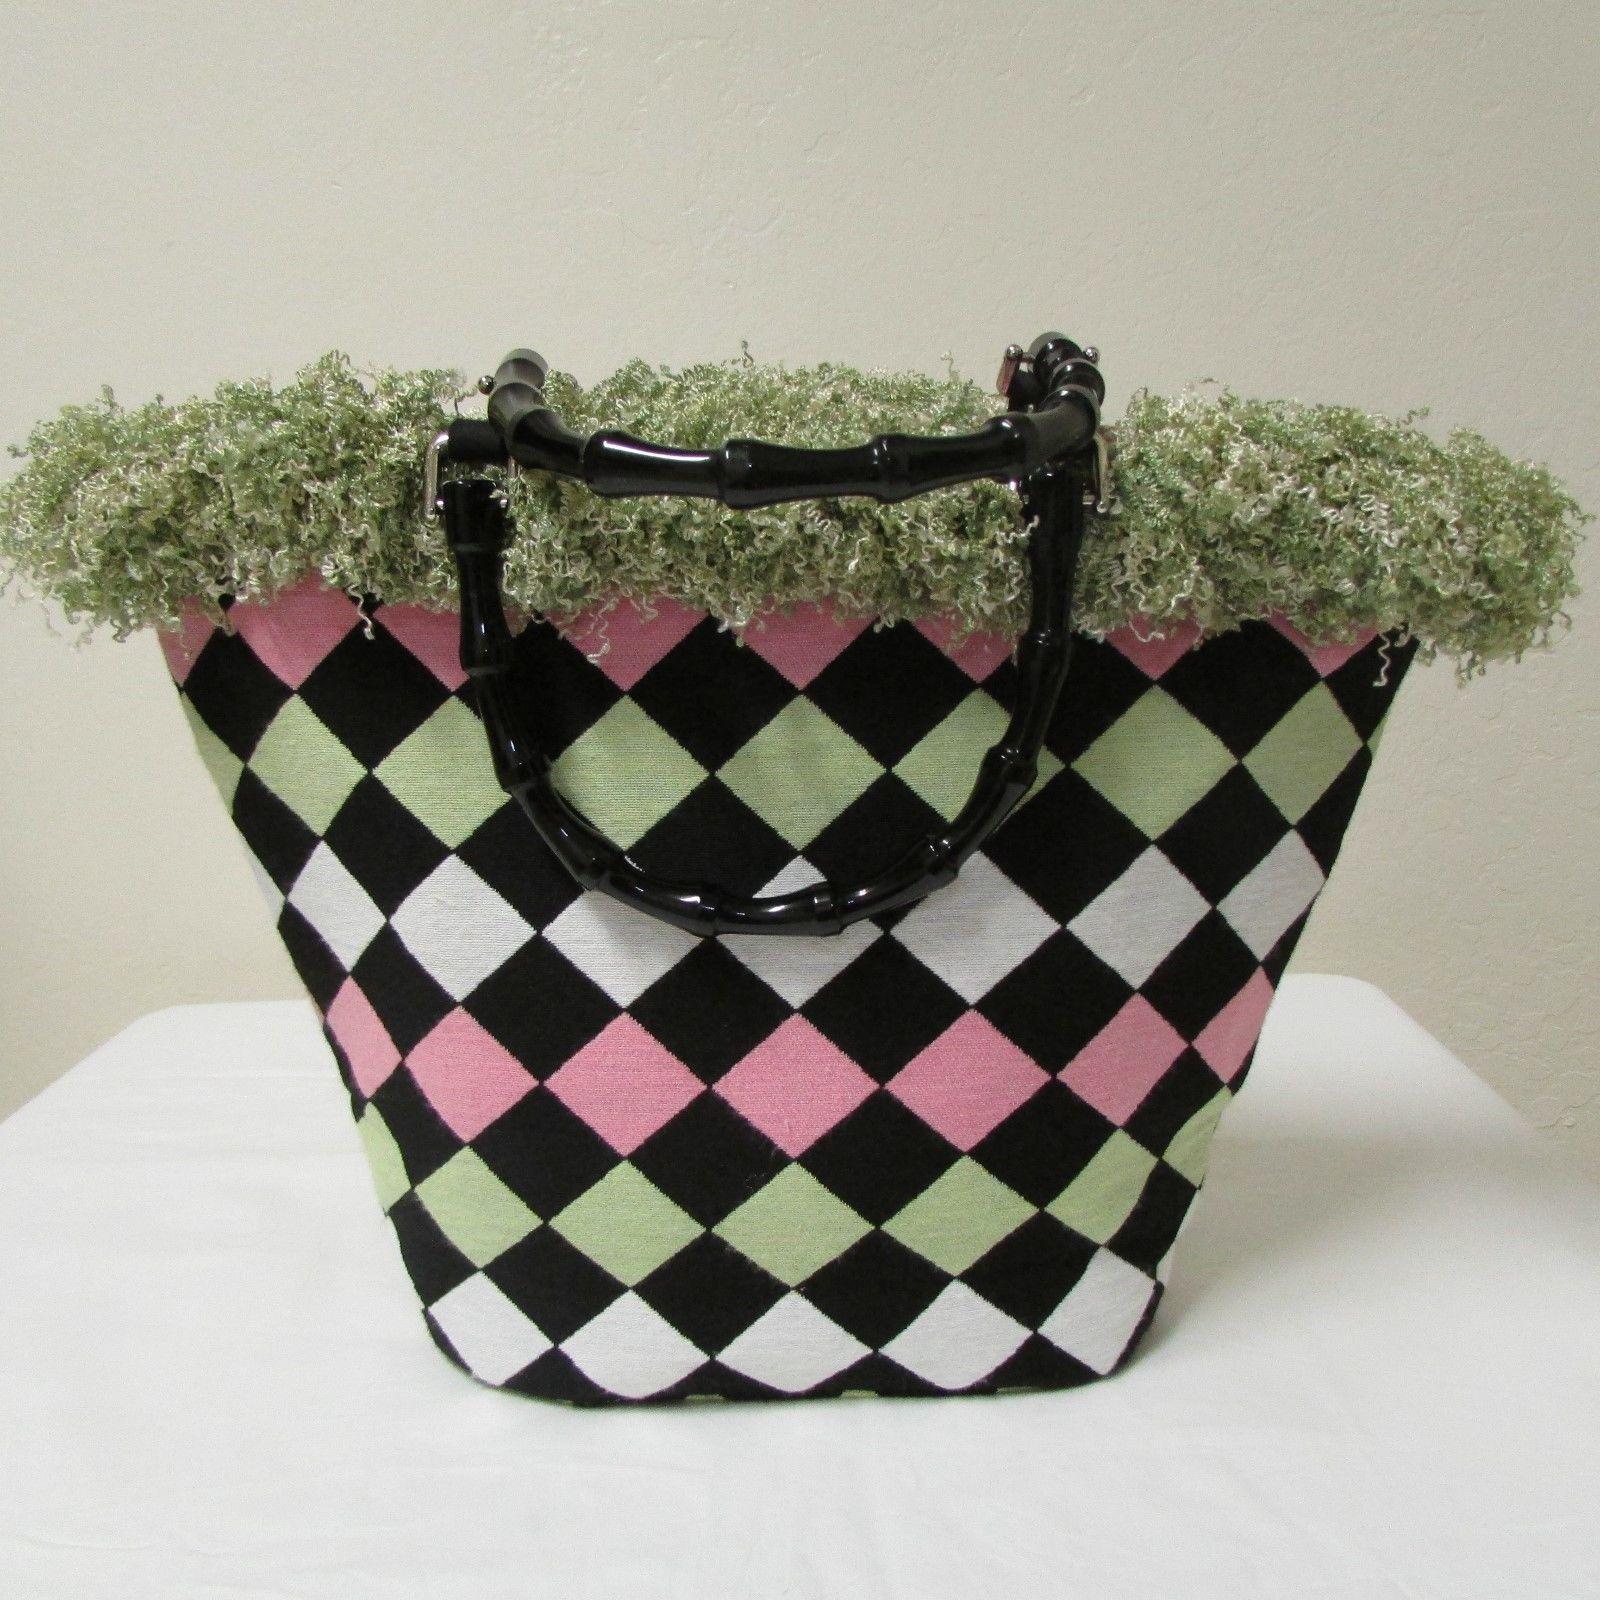 NWOT Bag Daddy Fabric Lime Green Pink Black Handbag Black Bamboo Style Handles image 2